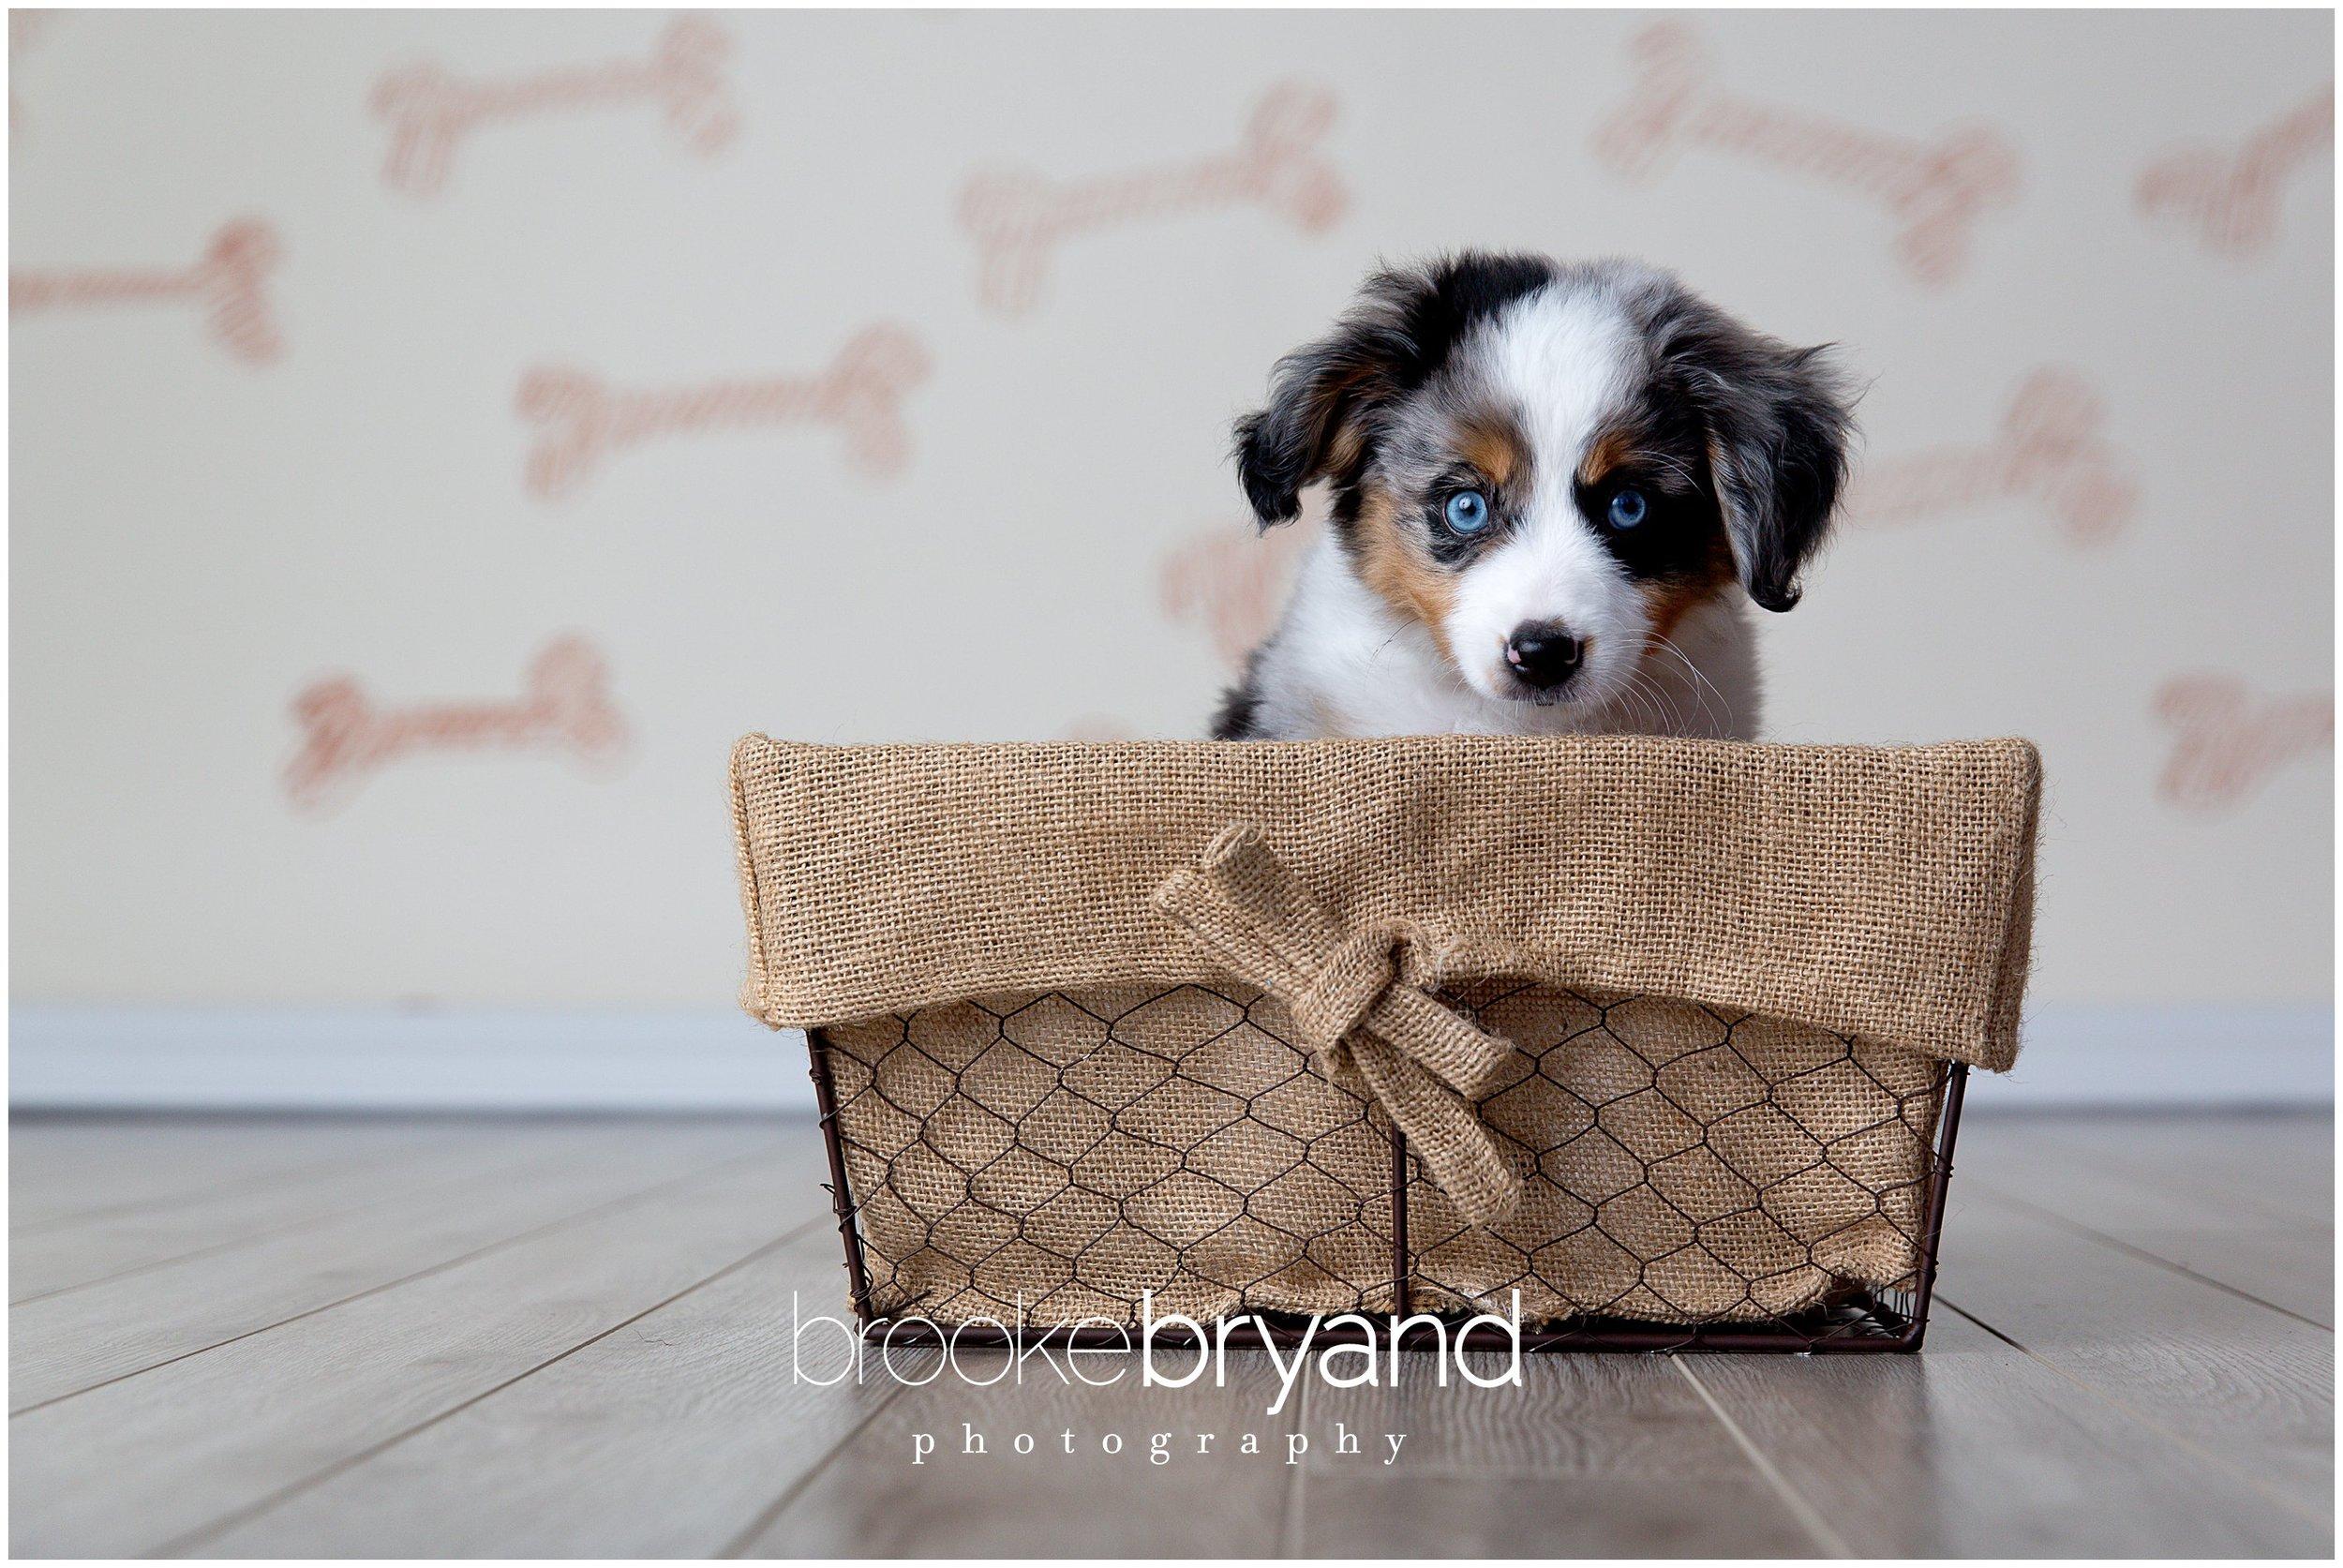 07.2014-Swangler-Puppy-photoshoot-BBP_3222_San-Francisco-Family-Photos-Brooke-Bryand-Photography.jpg